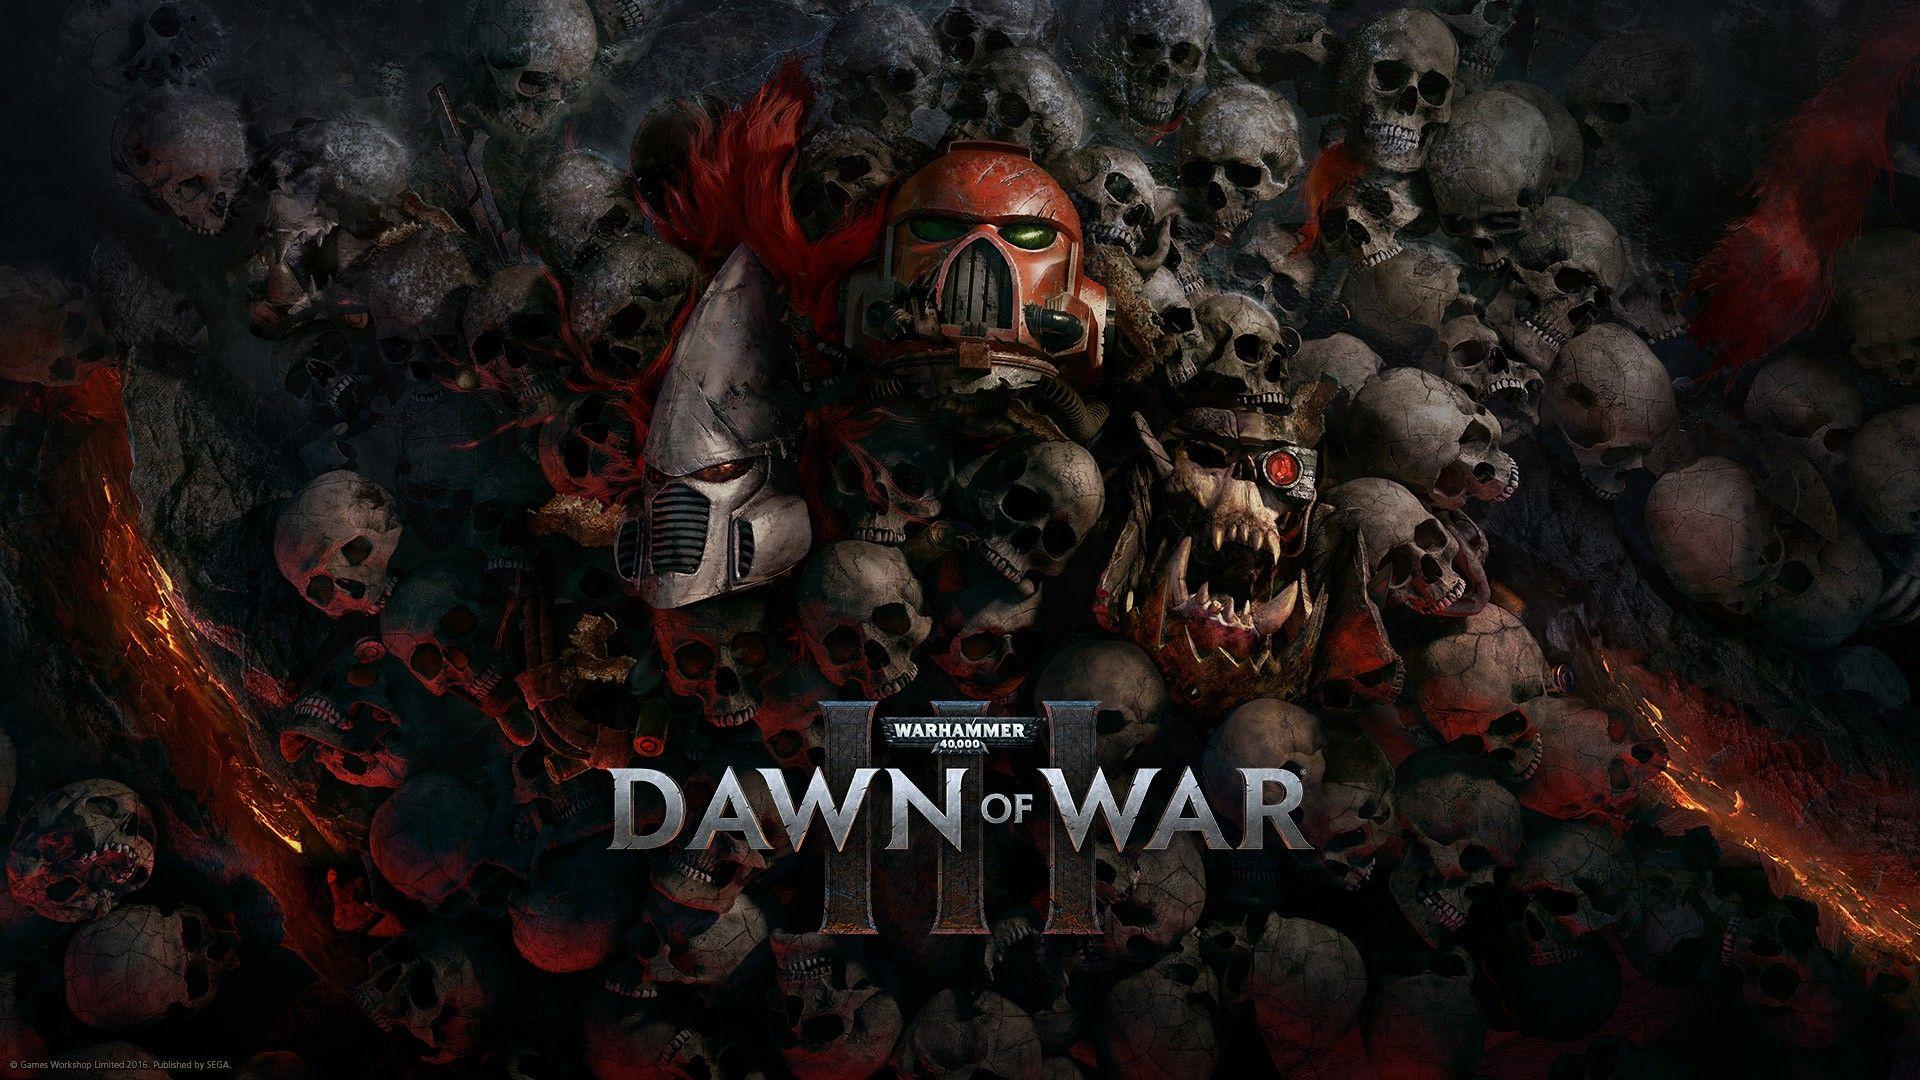 Warhammer 40k death company wallpaper - Warhammer 40 000 Dawn Of War Iii Wallpapers Cool Hd